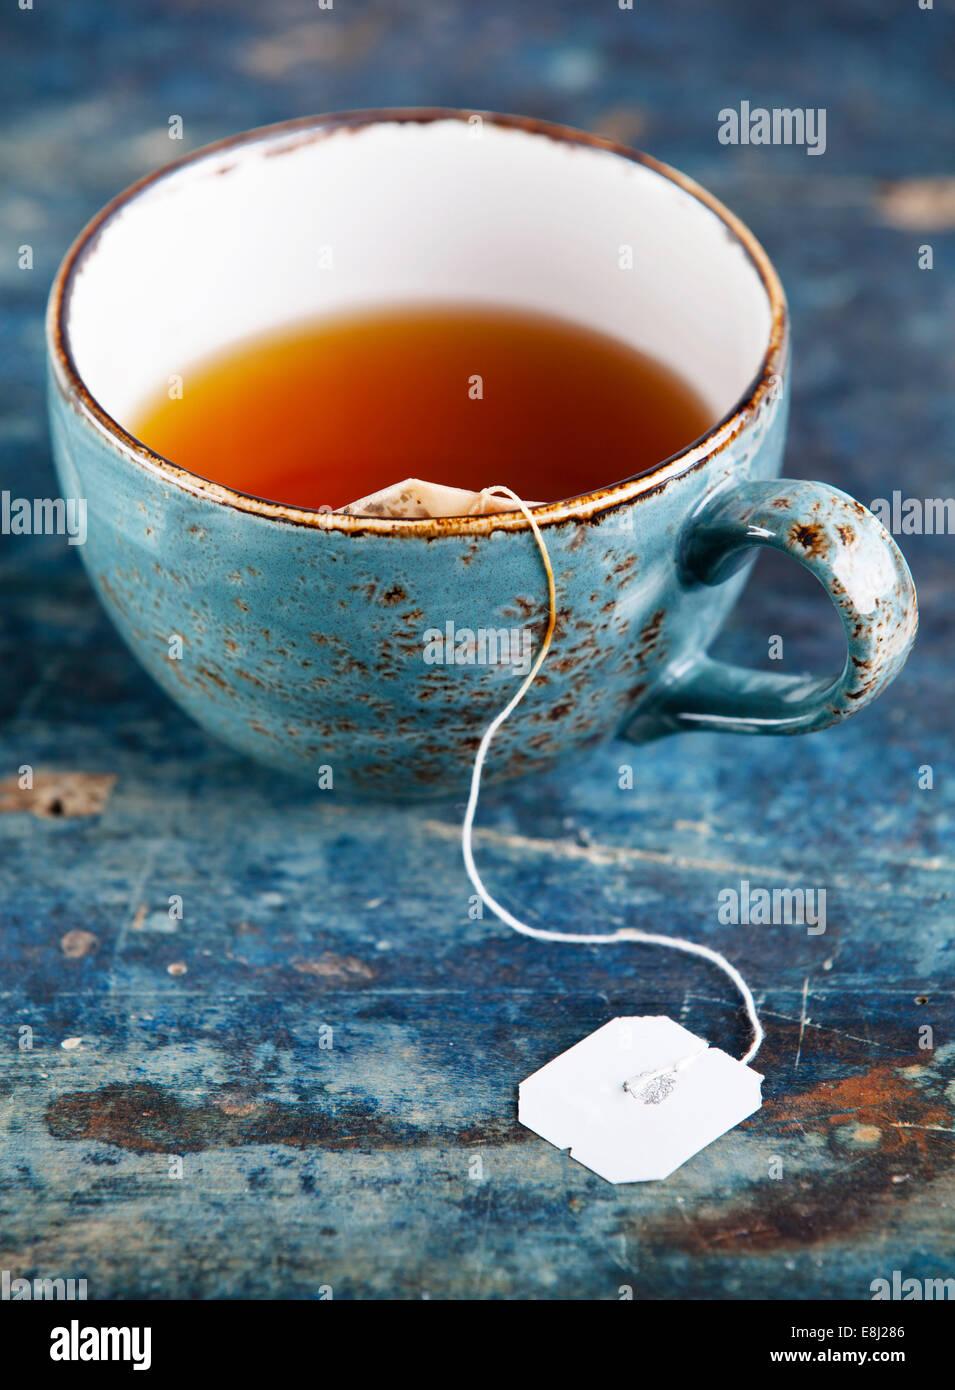 Tasse de thé avec sachet on blue background Photo Stock